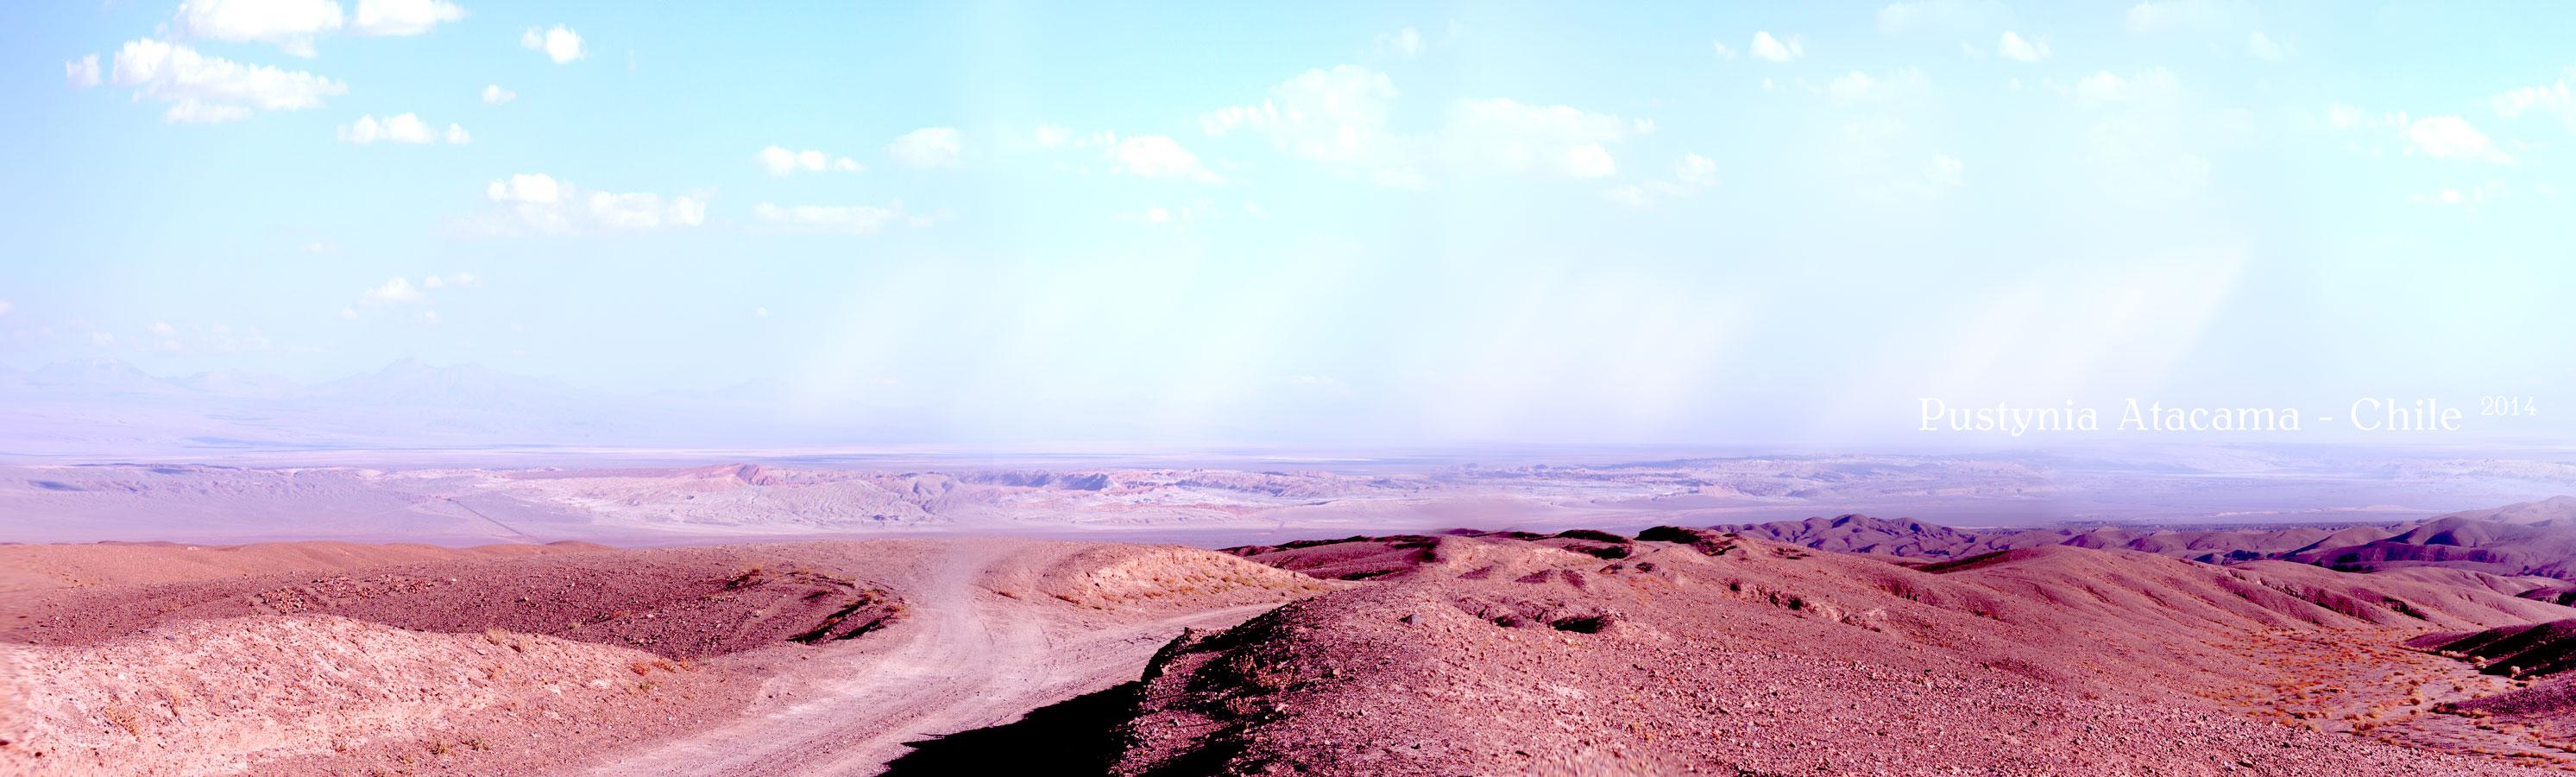 Atacama desert Chile 2014